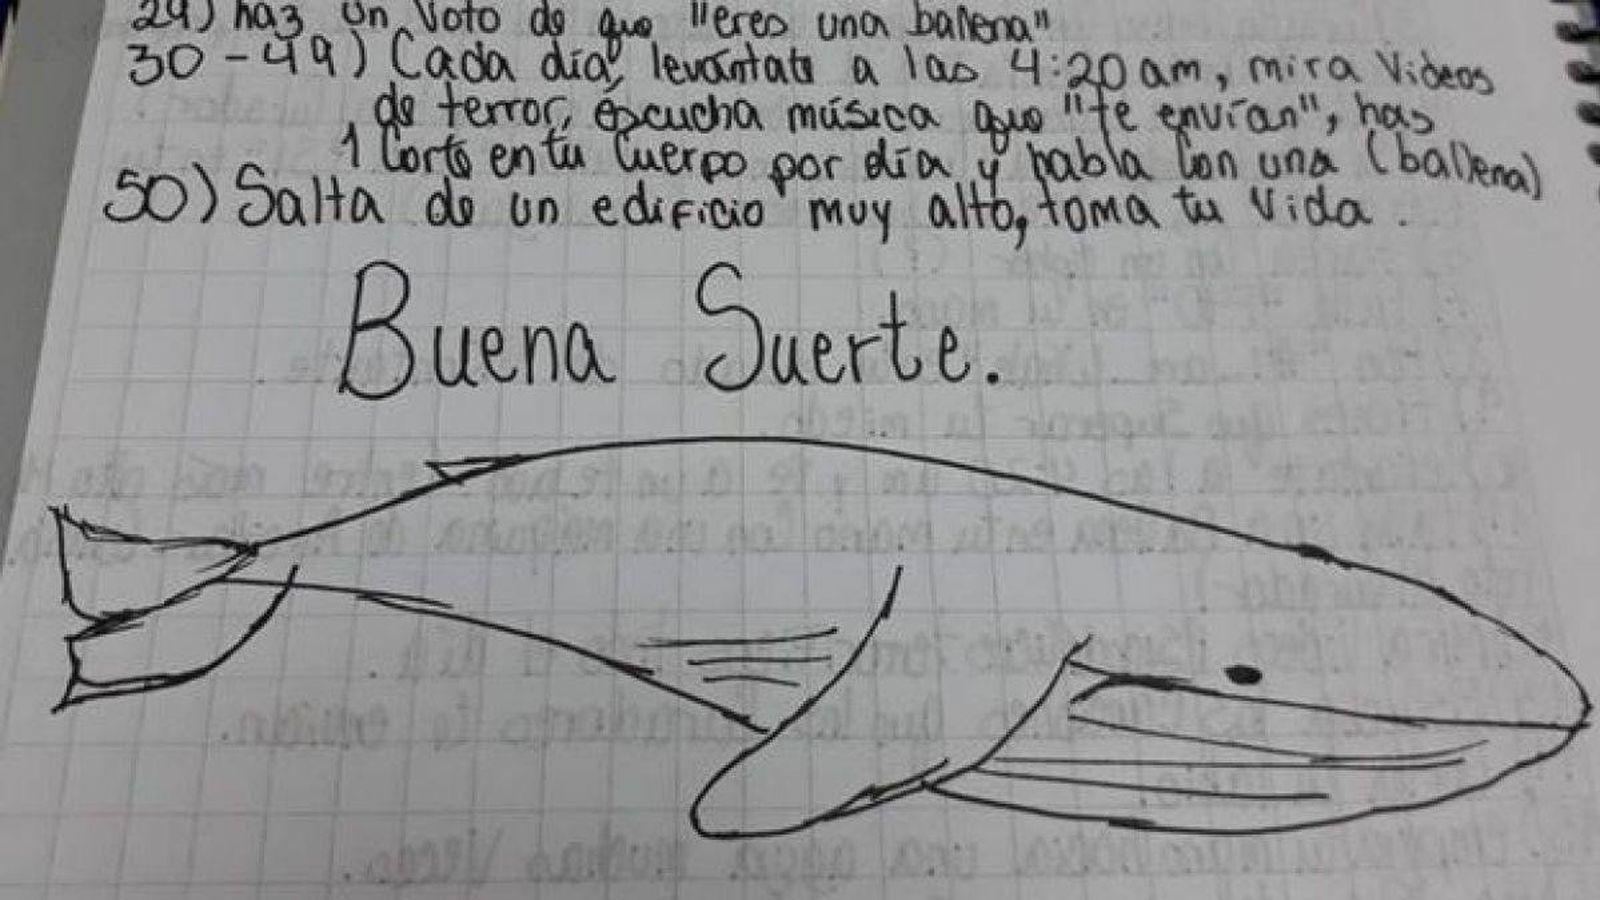 Latam - América Latina: La ballena azul, ¿responsable de la ola de ...